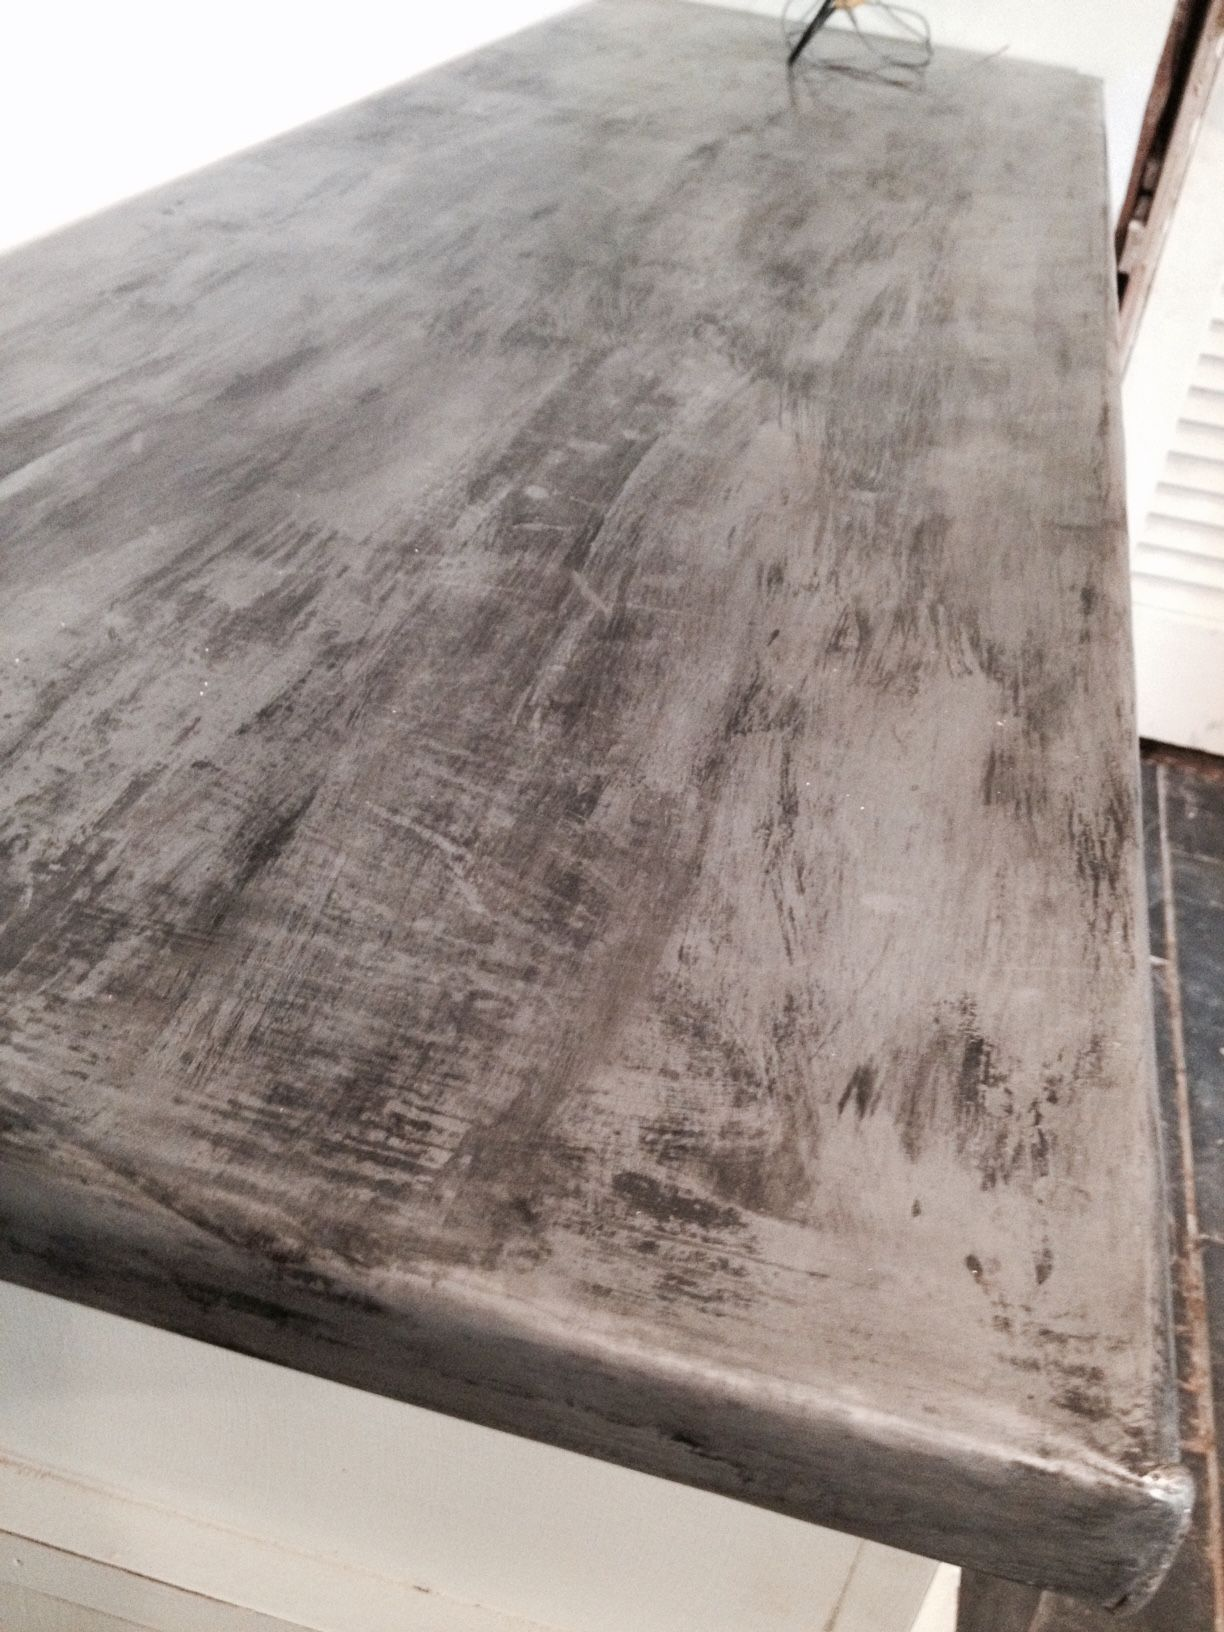 Make Me Pretty Zinc Countertop Diy Diy Countertops Metal Countertops Zinc Countertops